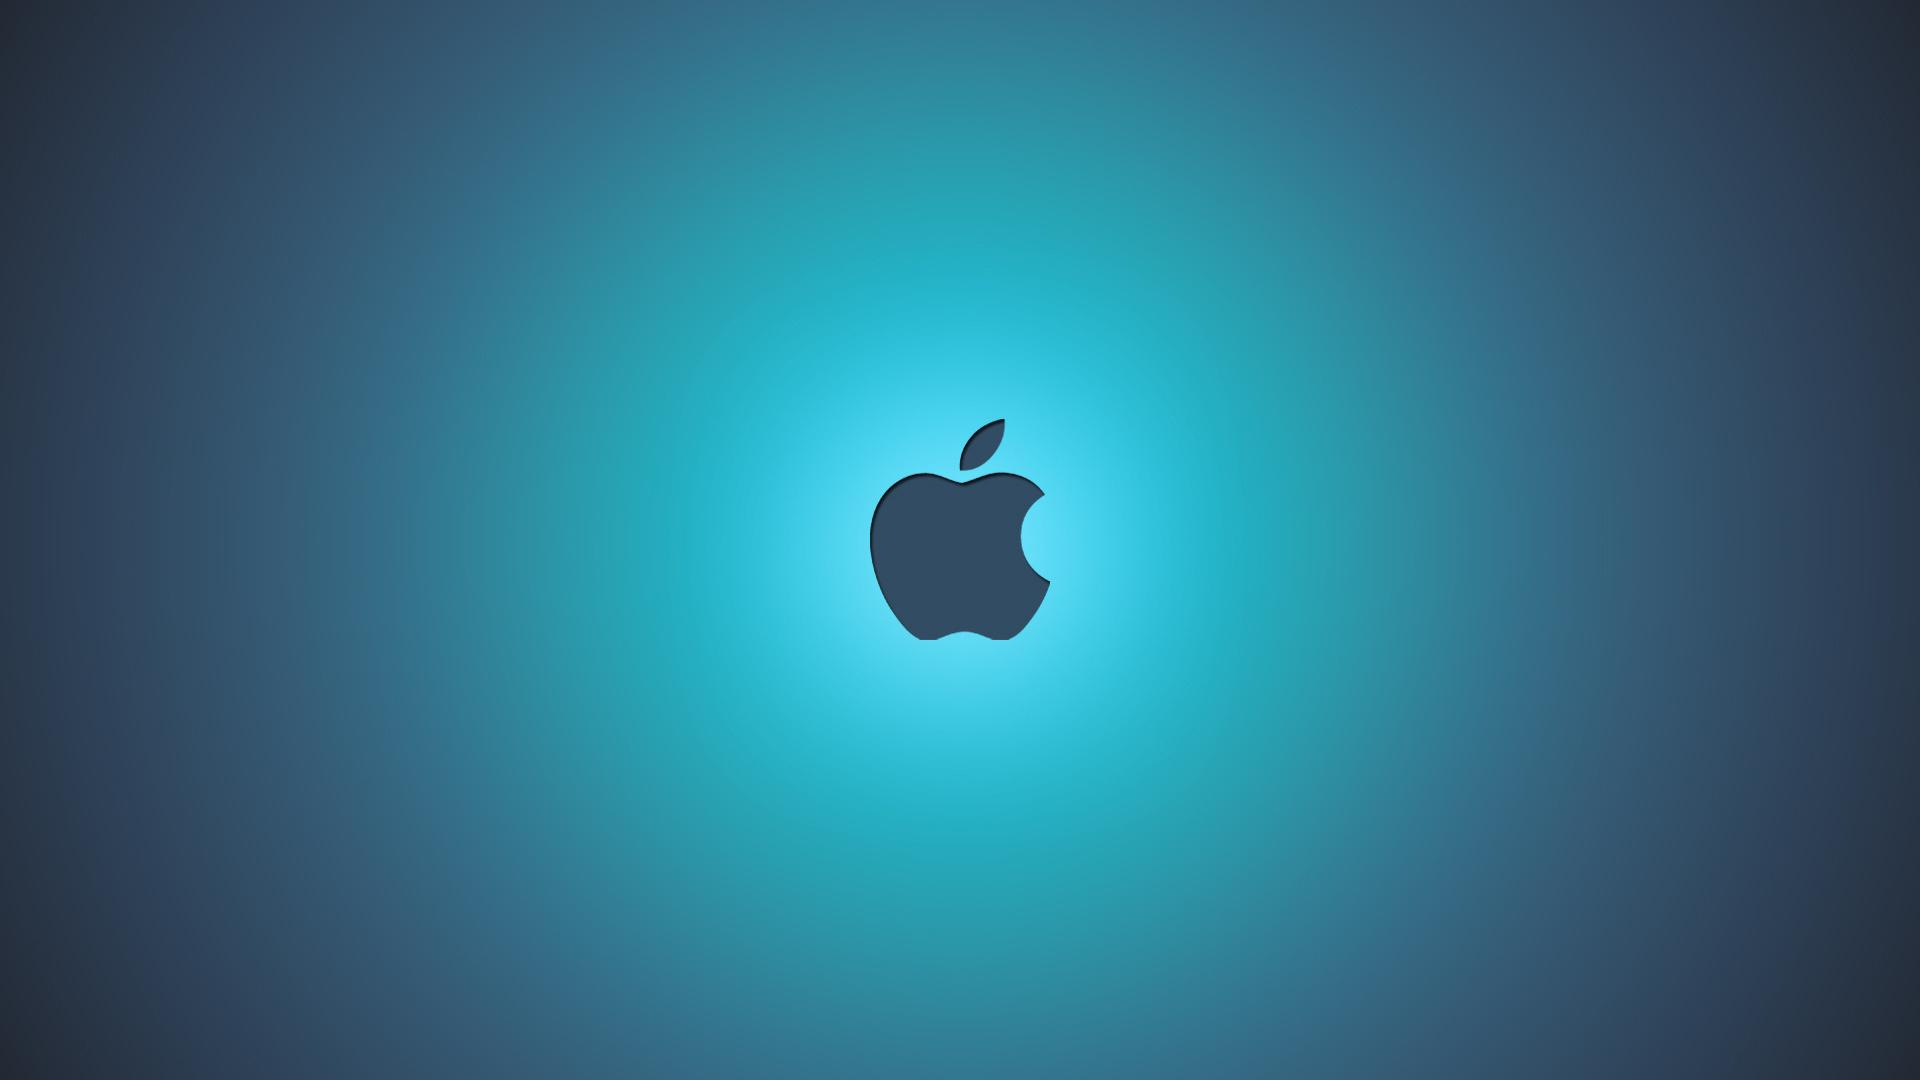 78 Best images about Apple HD Wallpaper on Pinterest | Logos, Best